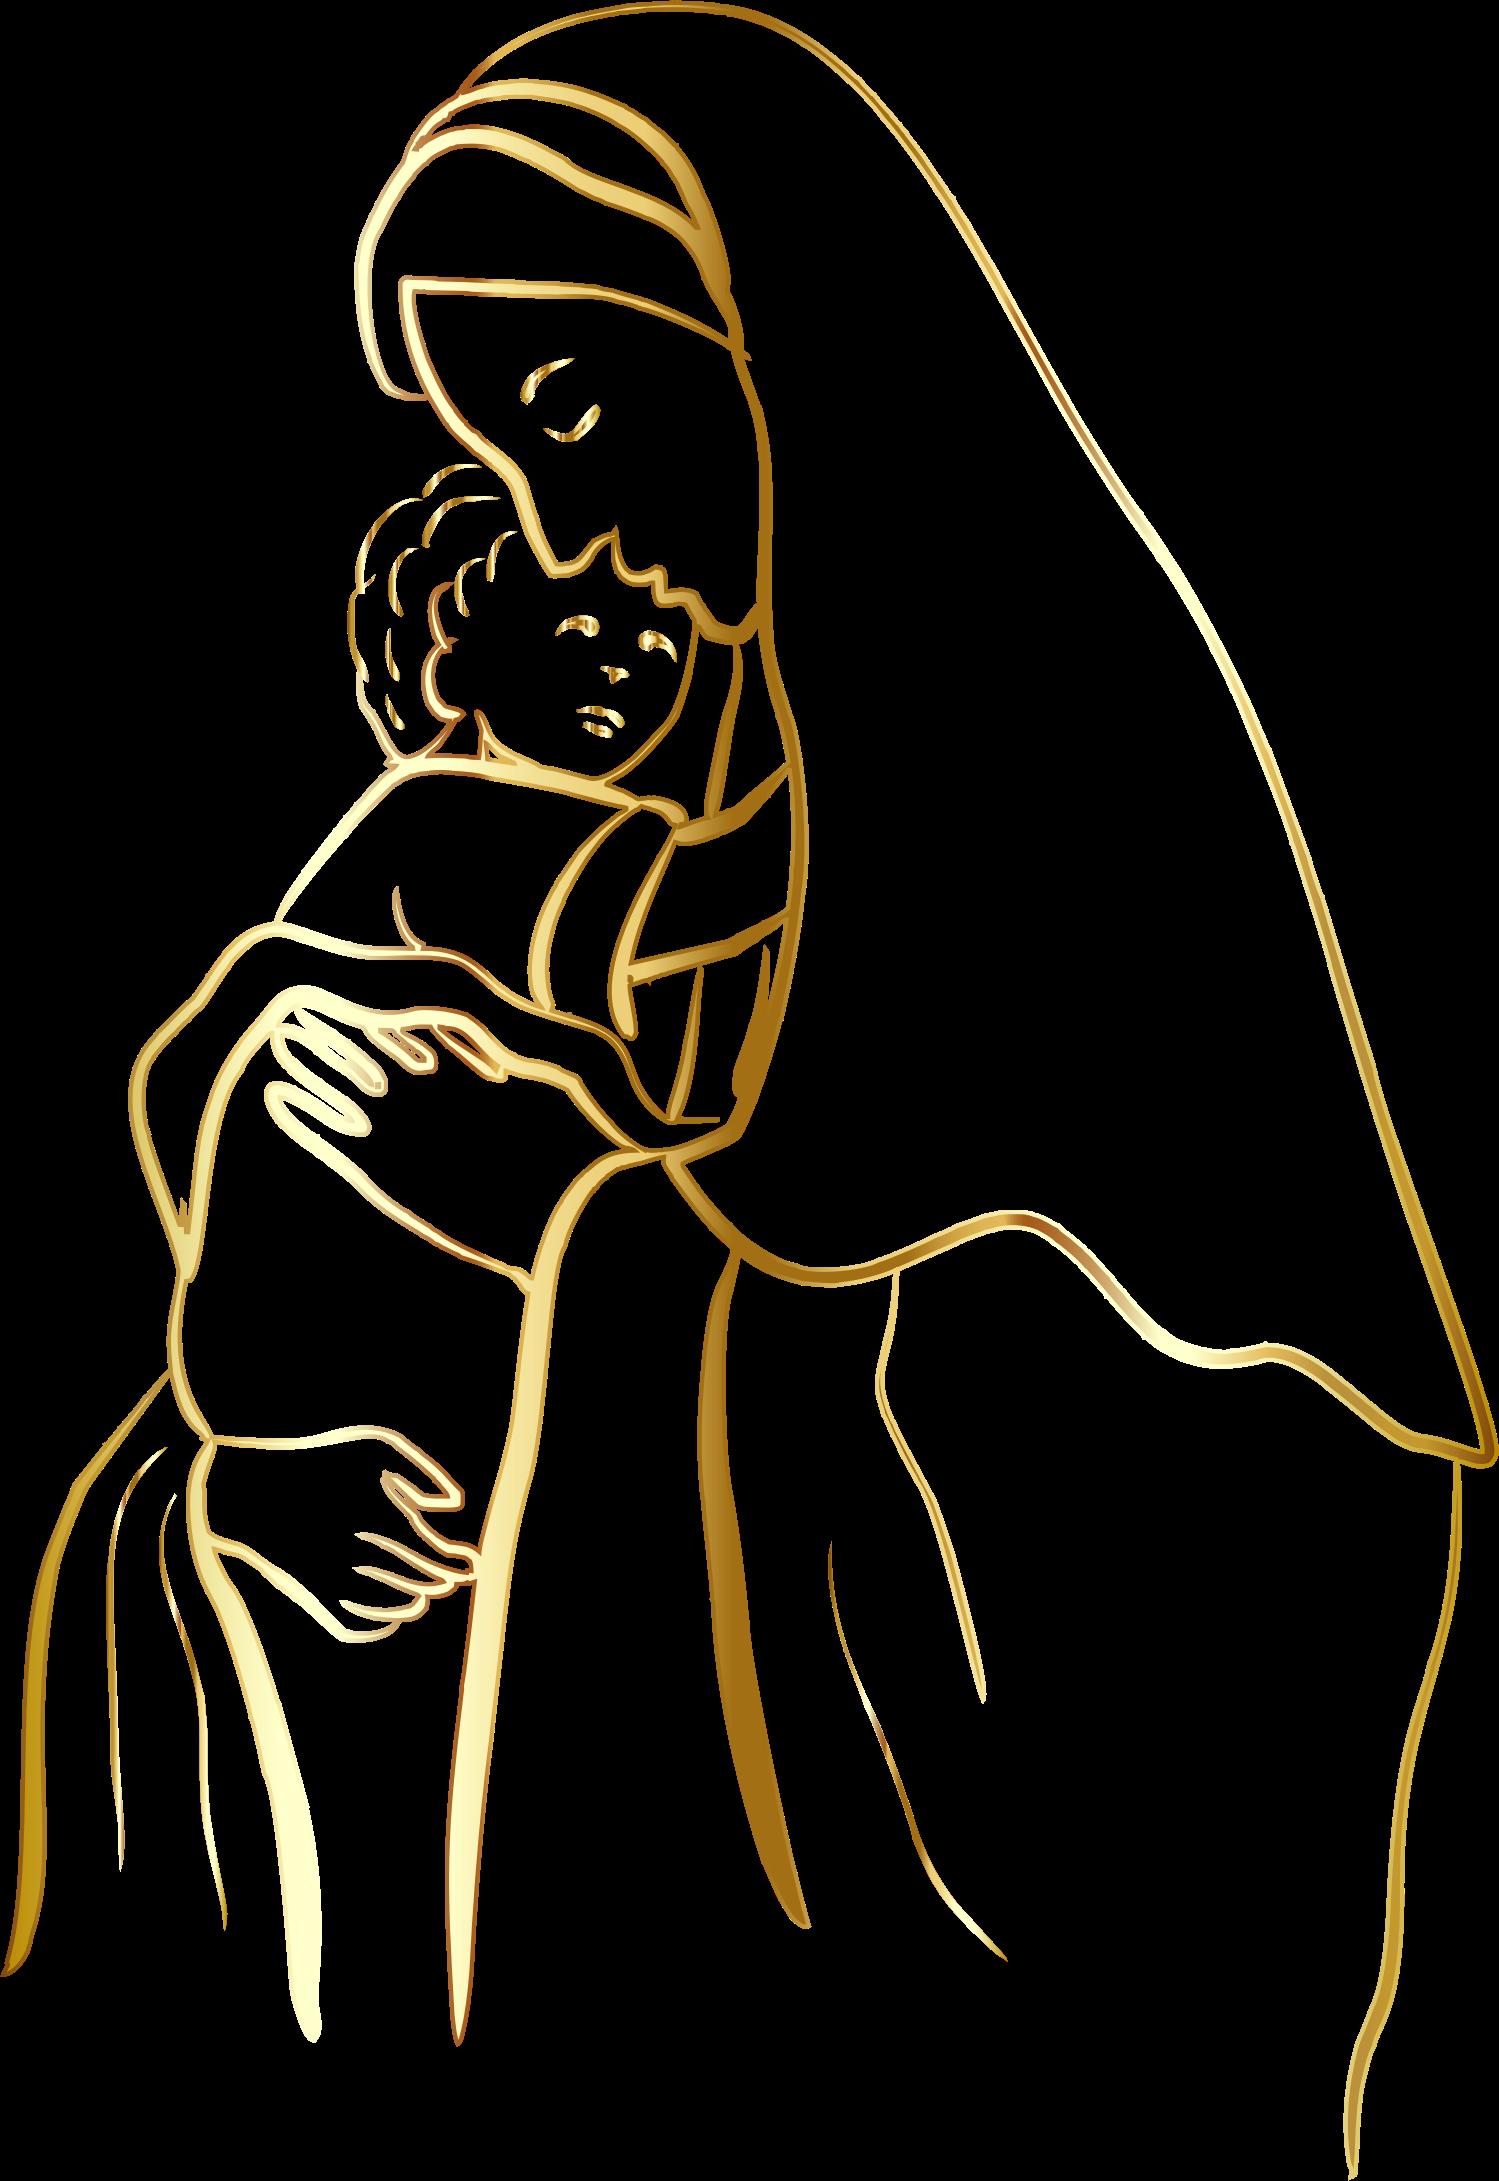 1499x2181 Child Jesus Desktop Wallpaper Religion Clip Art